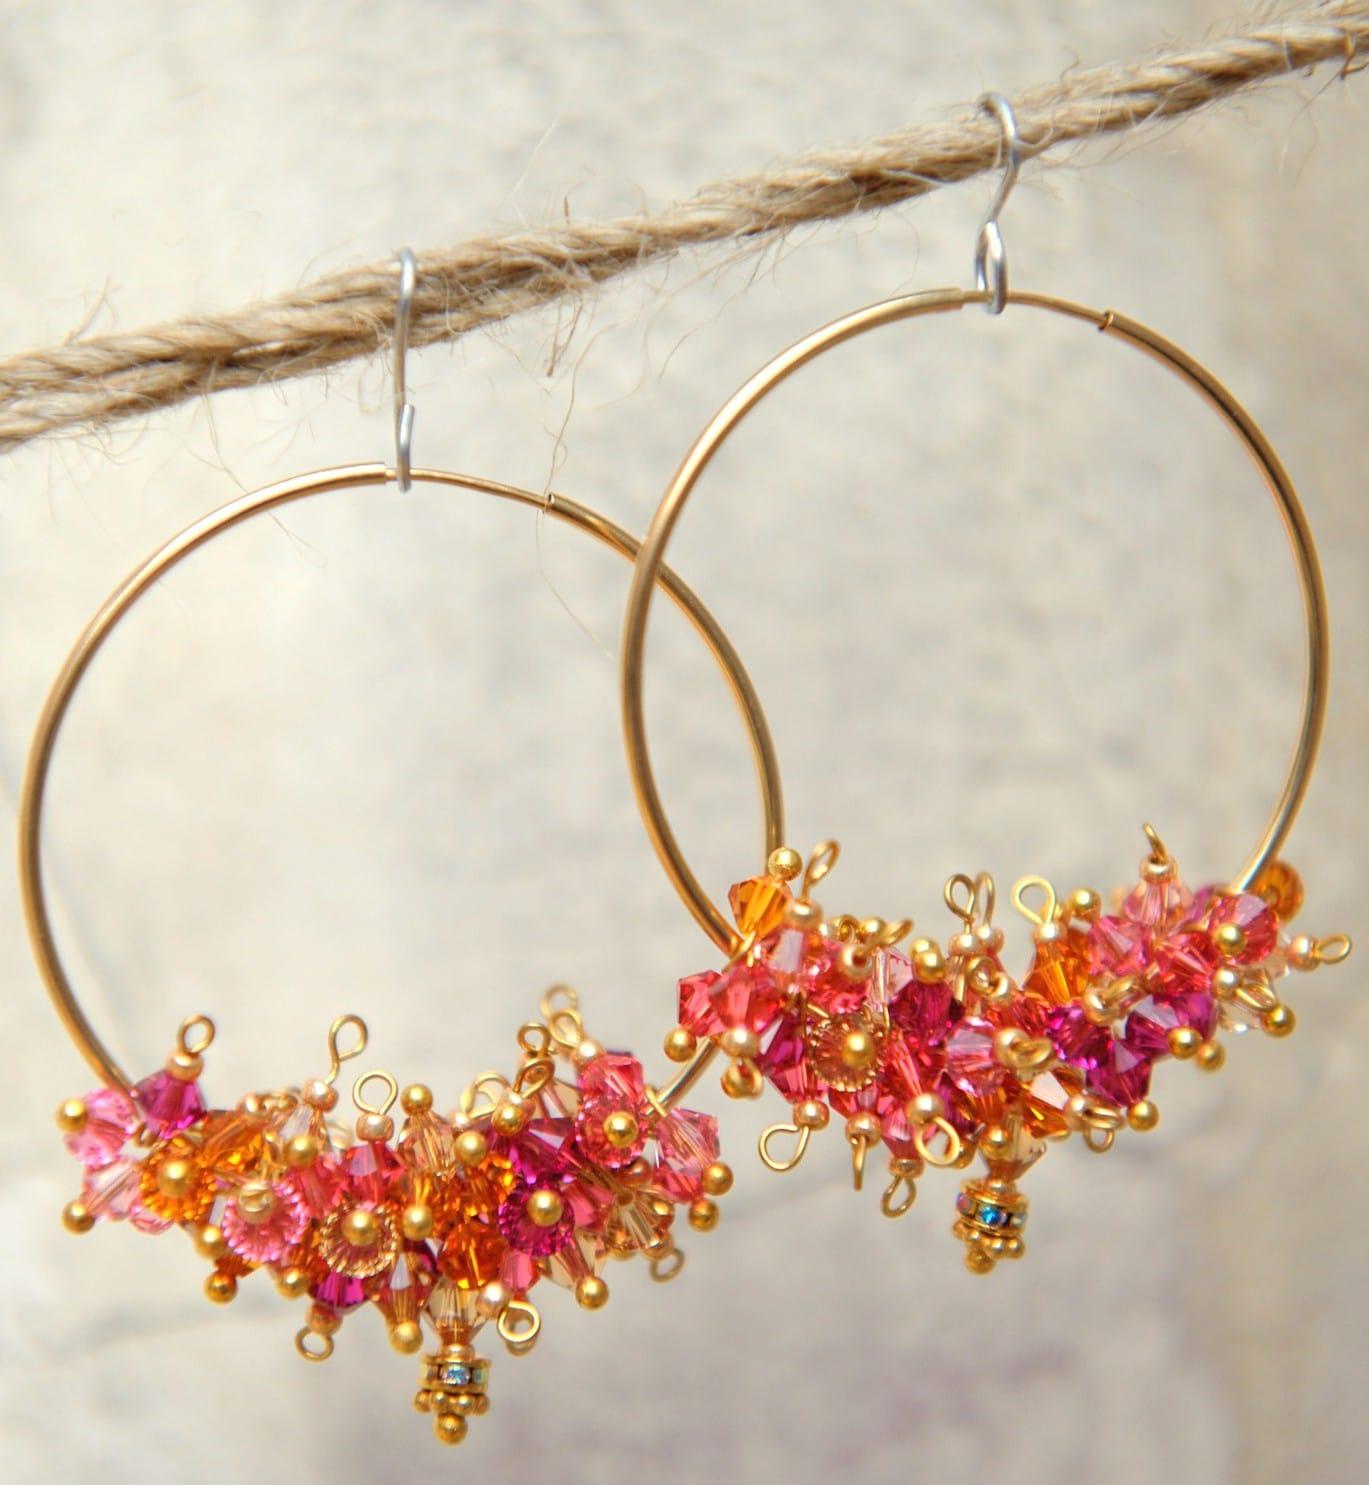 handmade jewelry picture